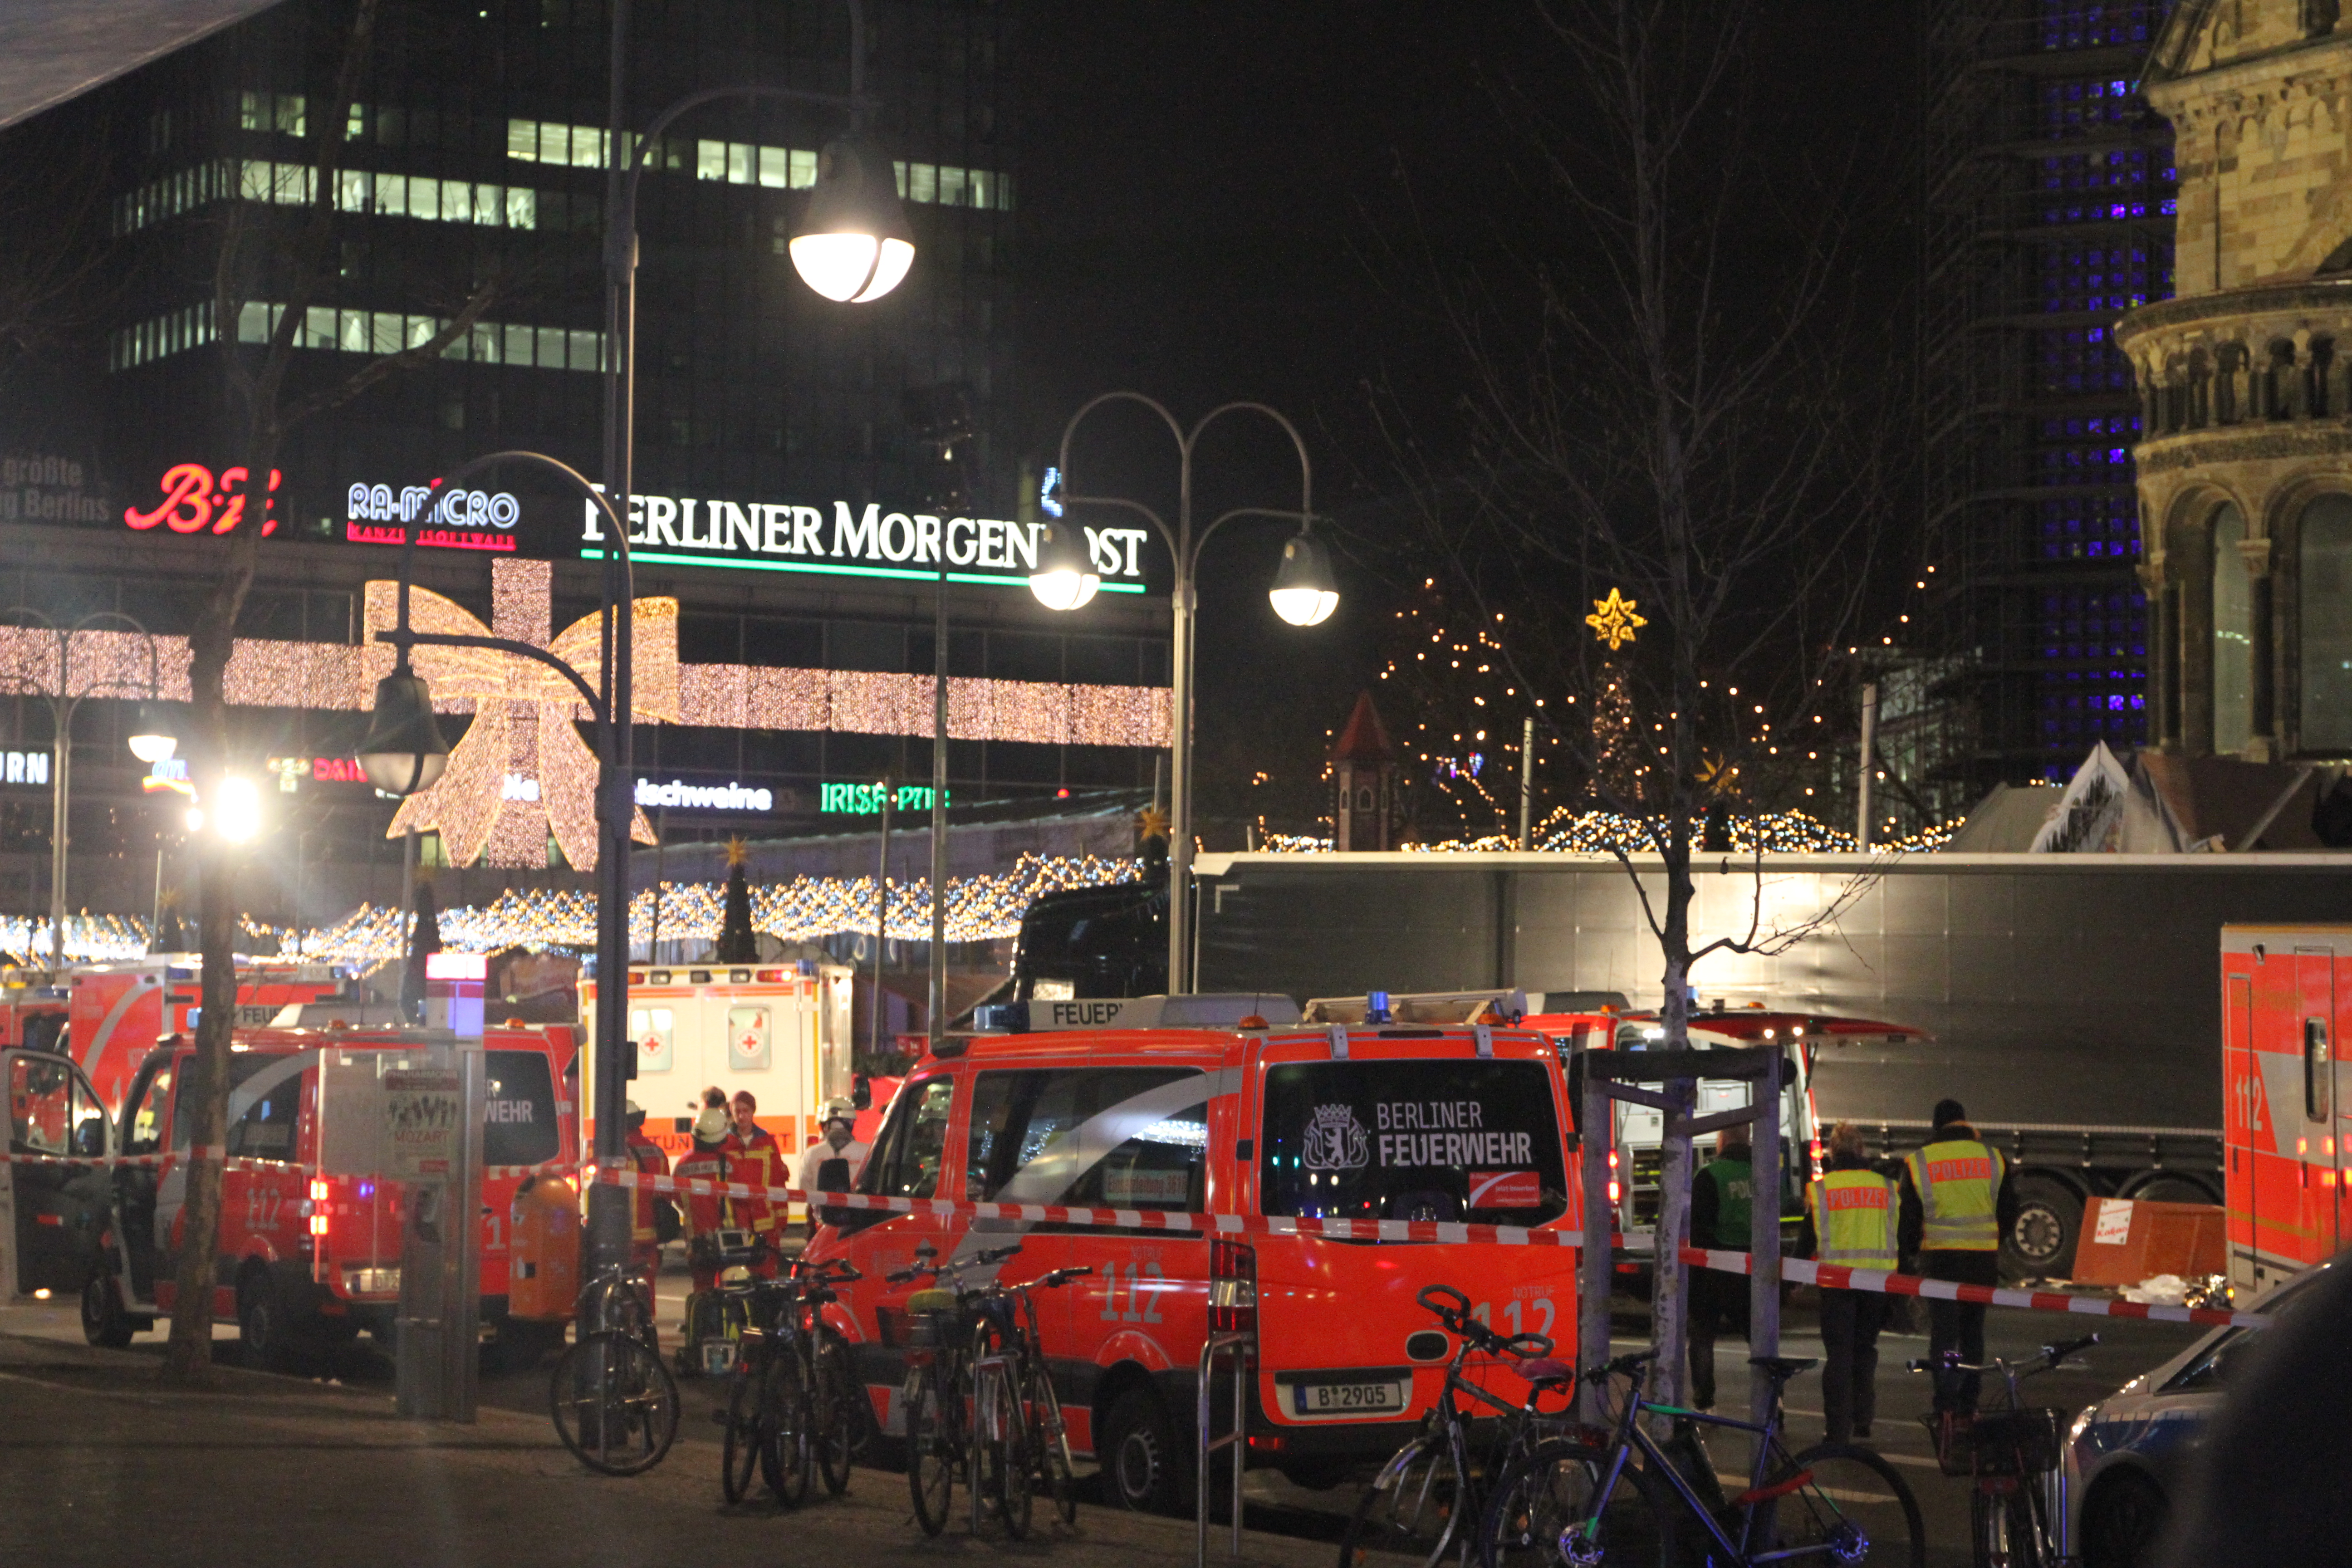 2016 Berlin truck attack - Wikipedia